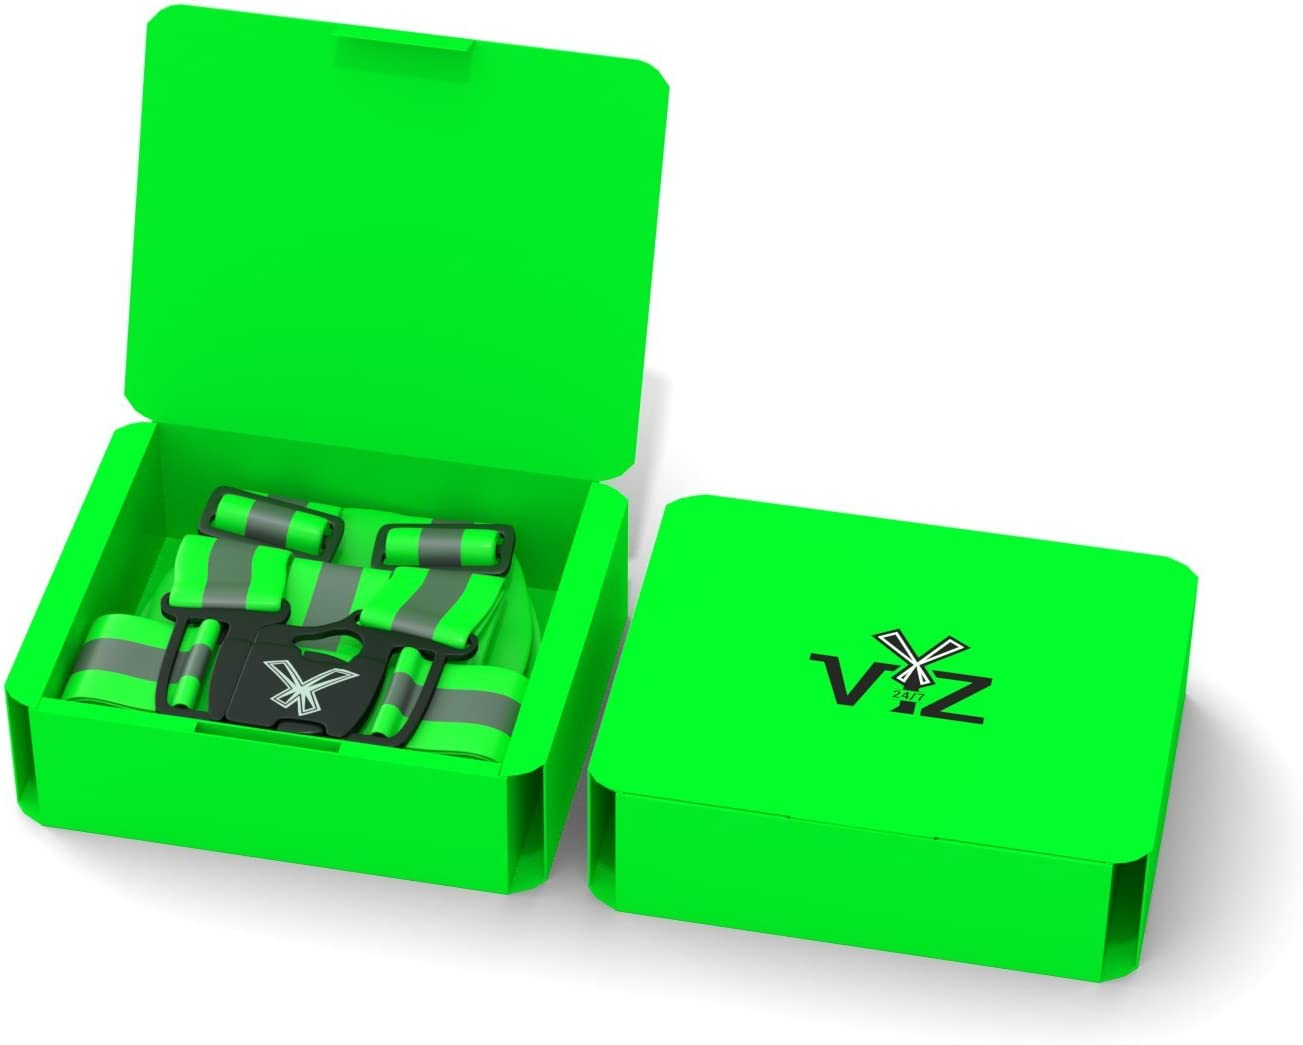 Motorcycle Safety Orange /& Pink Cycling High Visibility Neon Green Fully Adjustable /& Multi-Purpose: Running 247 Viz Reflective Vest with Hi Vis Bands Dog Walking